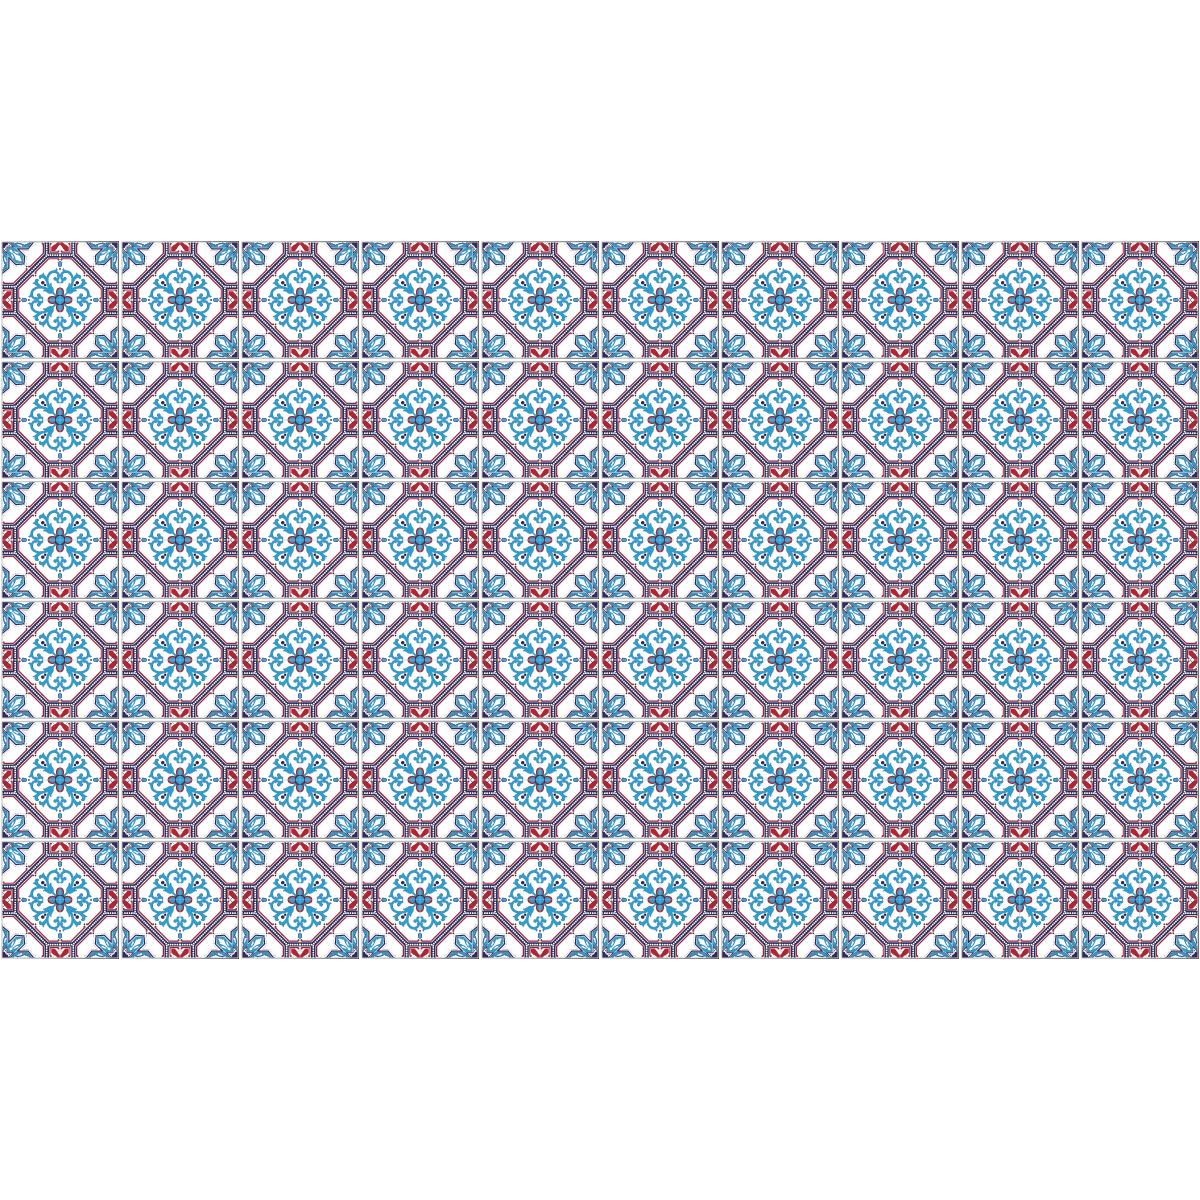 60 stickers carreaux de ciment azulejos aletha cuisine. Black Bedroom Furniture Sets. Home Design Ideas